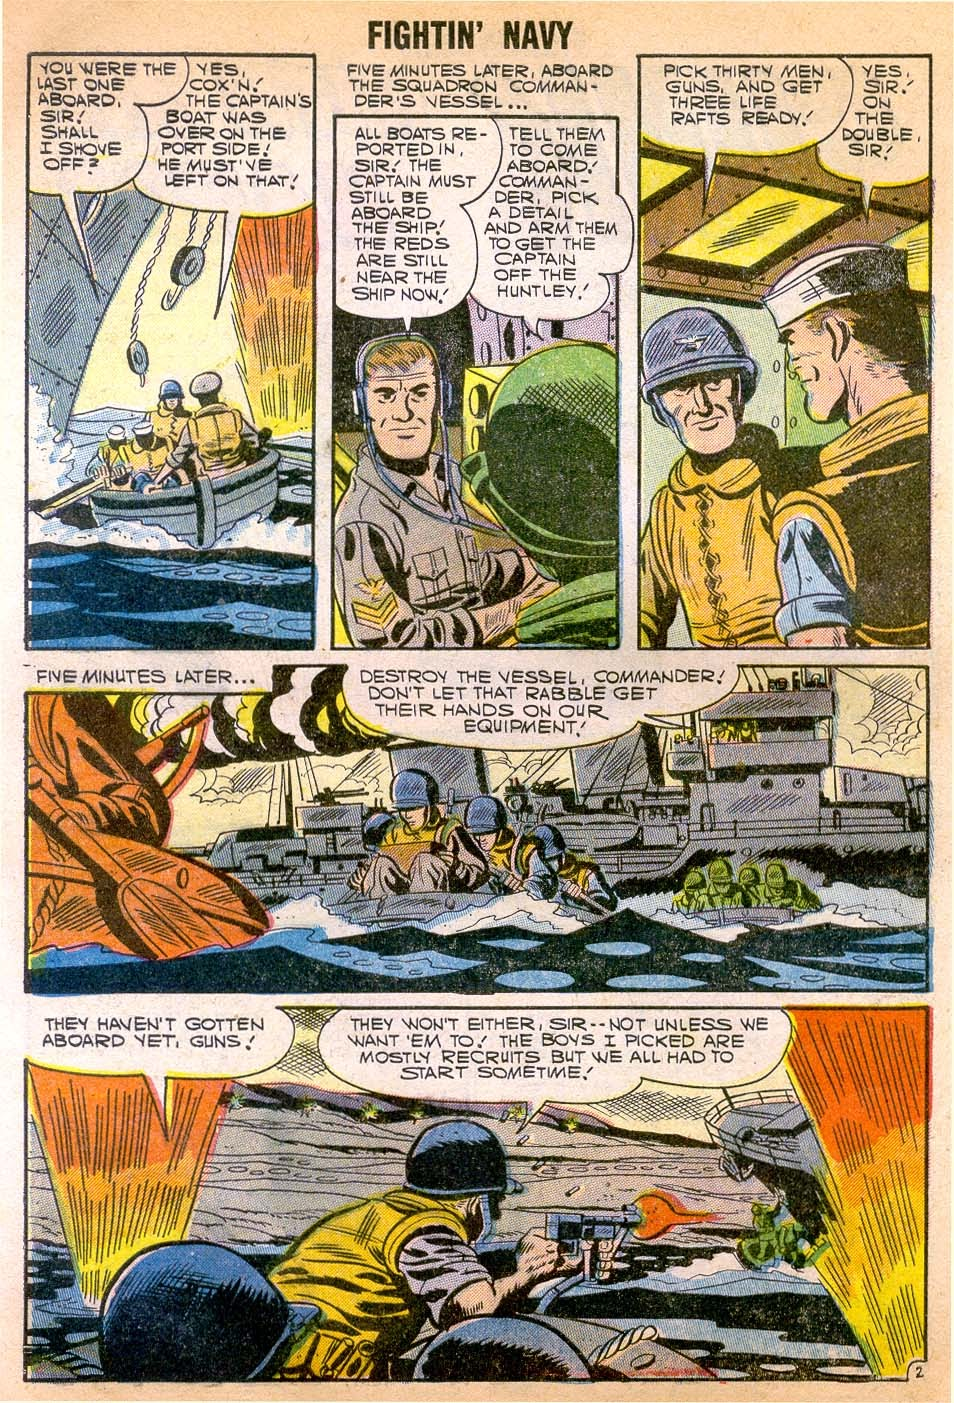 Read online Fightin' Navy comic -  Issue #79 - 28